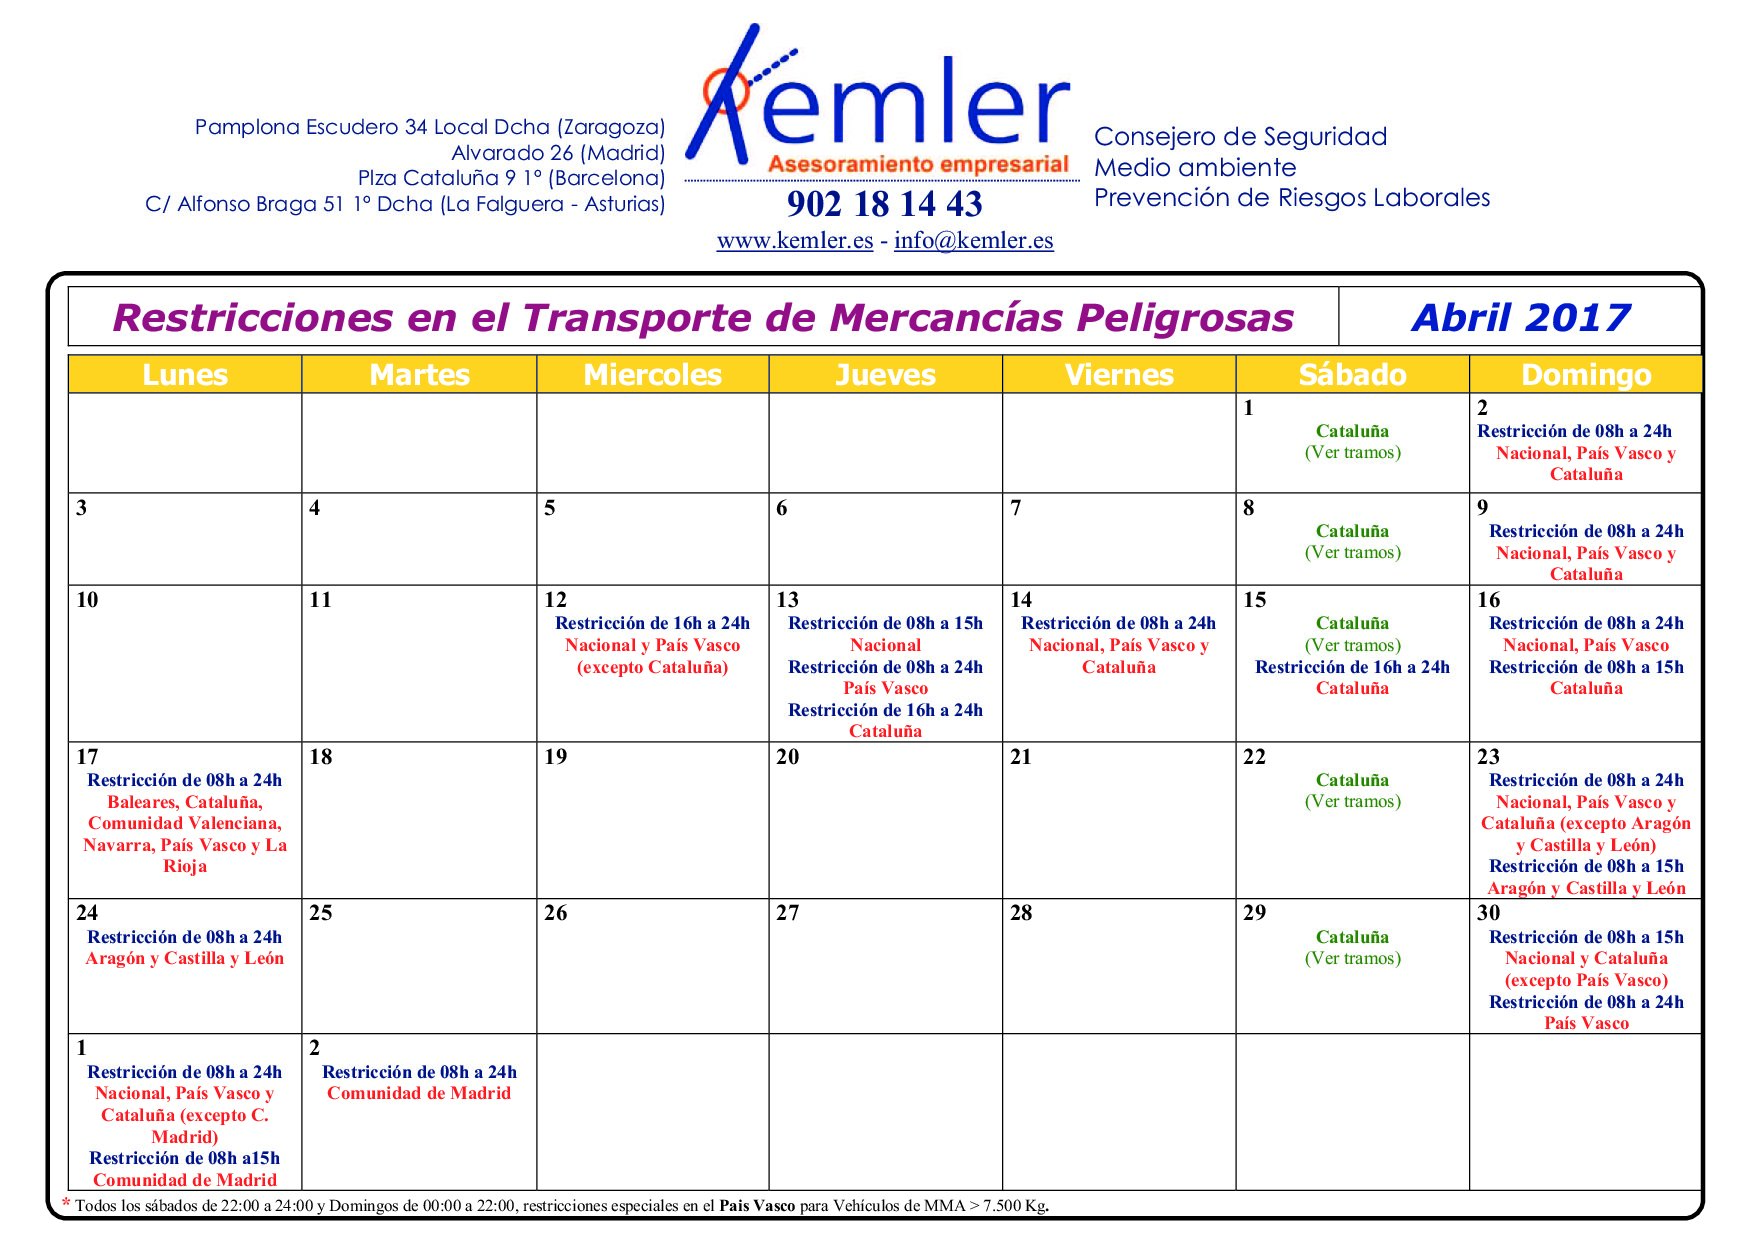 Restricciones_Transporte_de_Mercanc_as_Peligrosas_